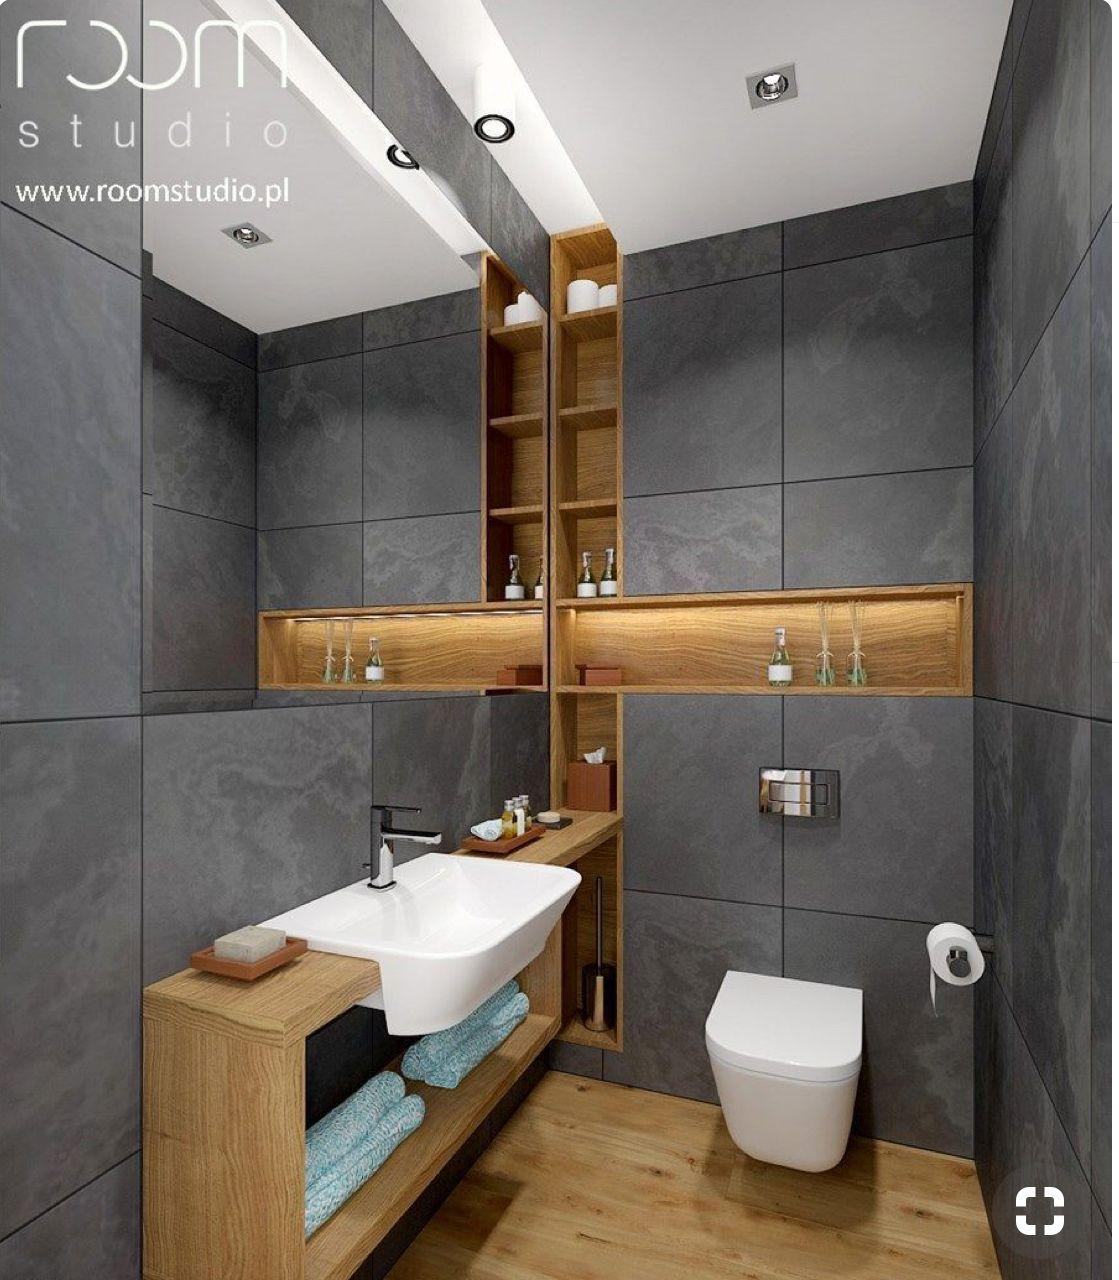 Pin By Tobi Fraus On Salle De Bain Toilet Design Modern Toilet Bathroom Interior Design